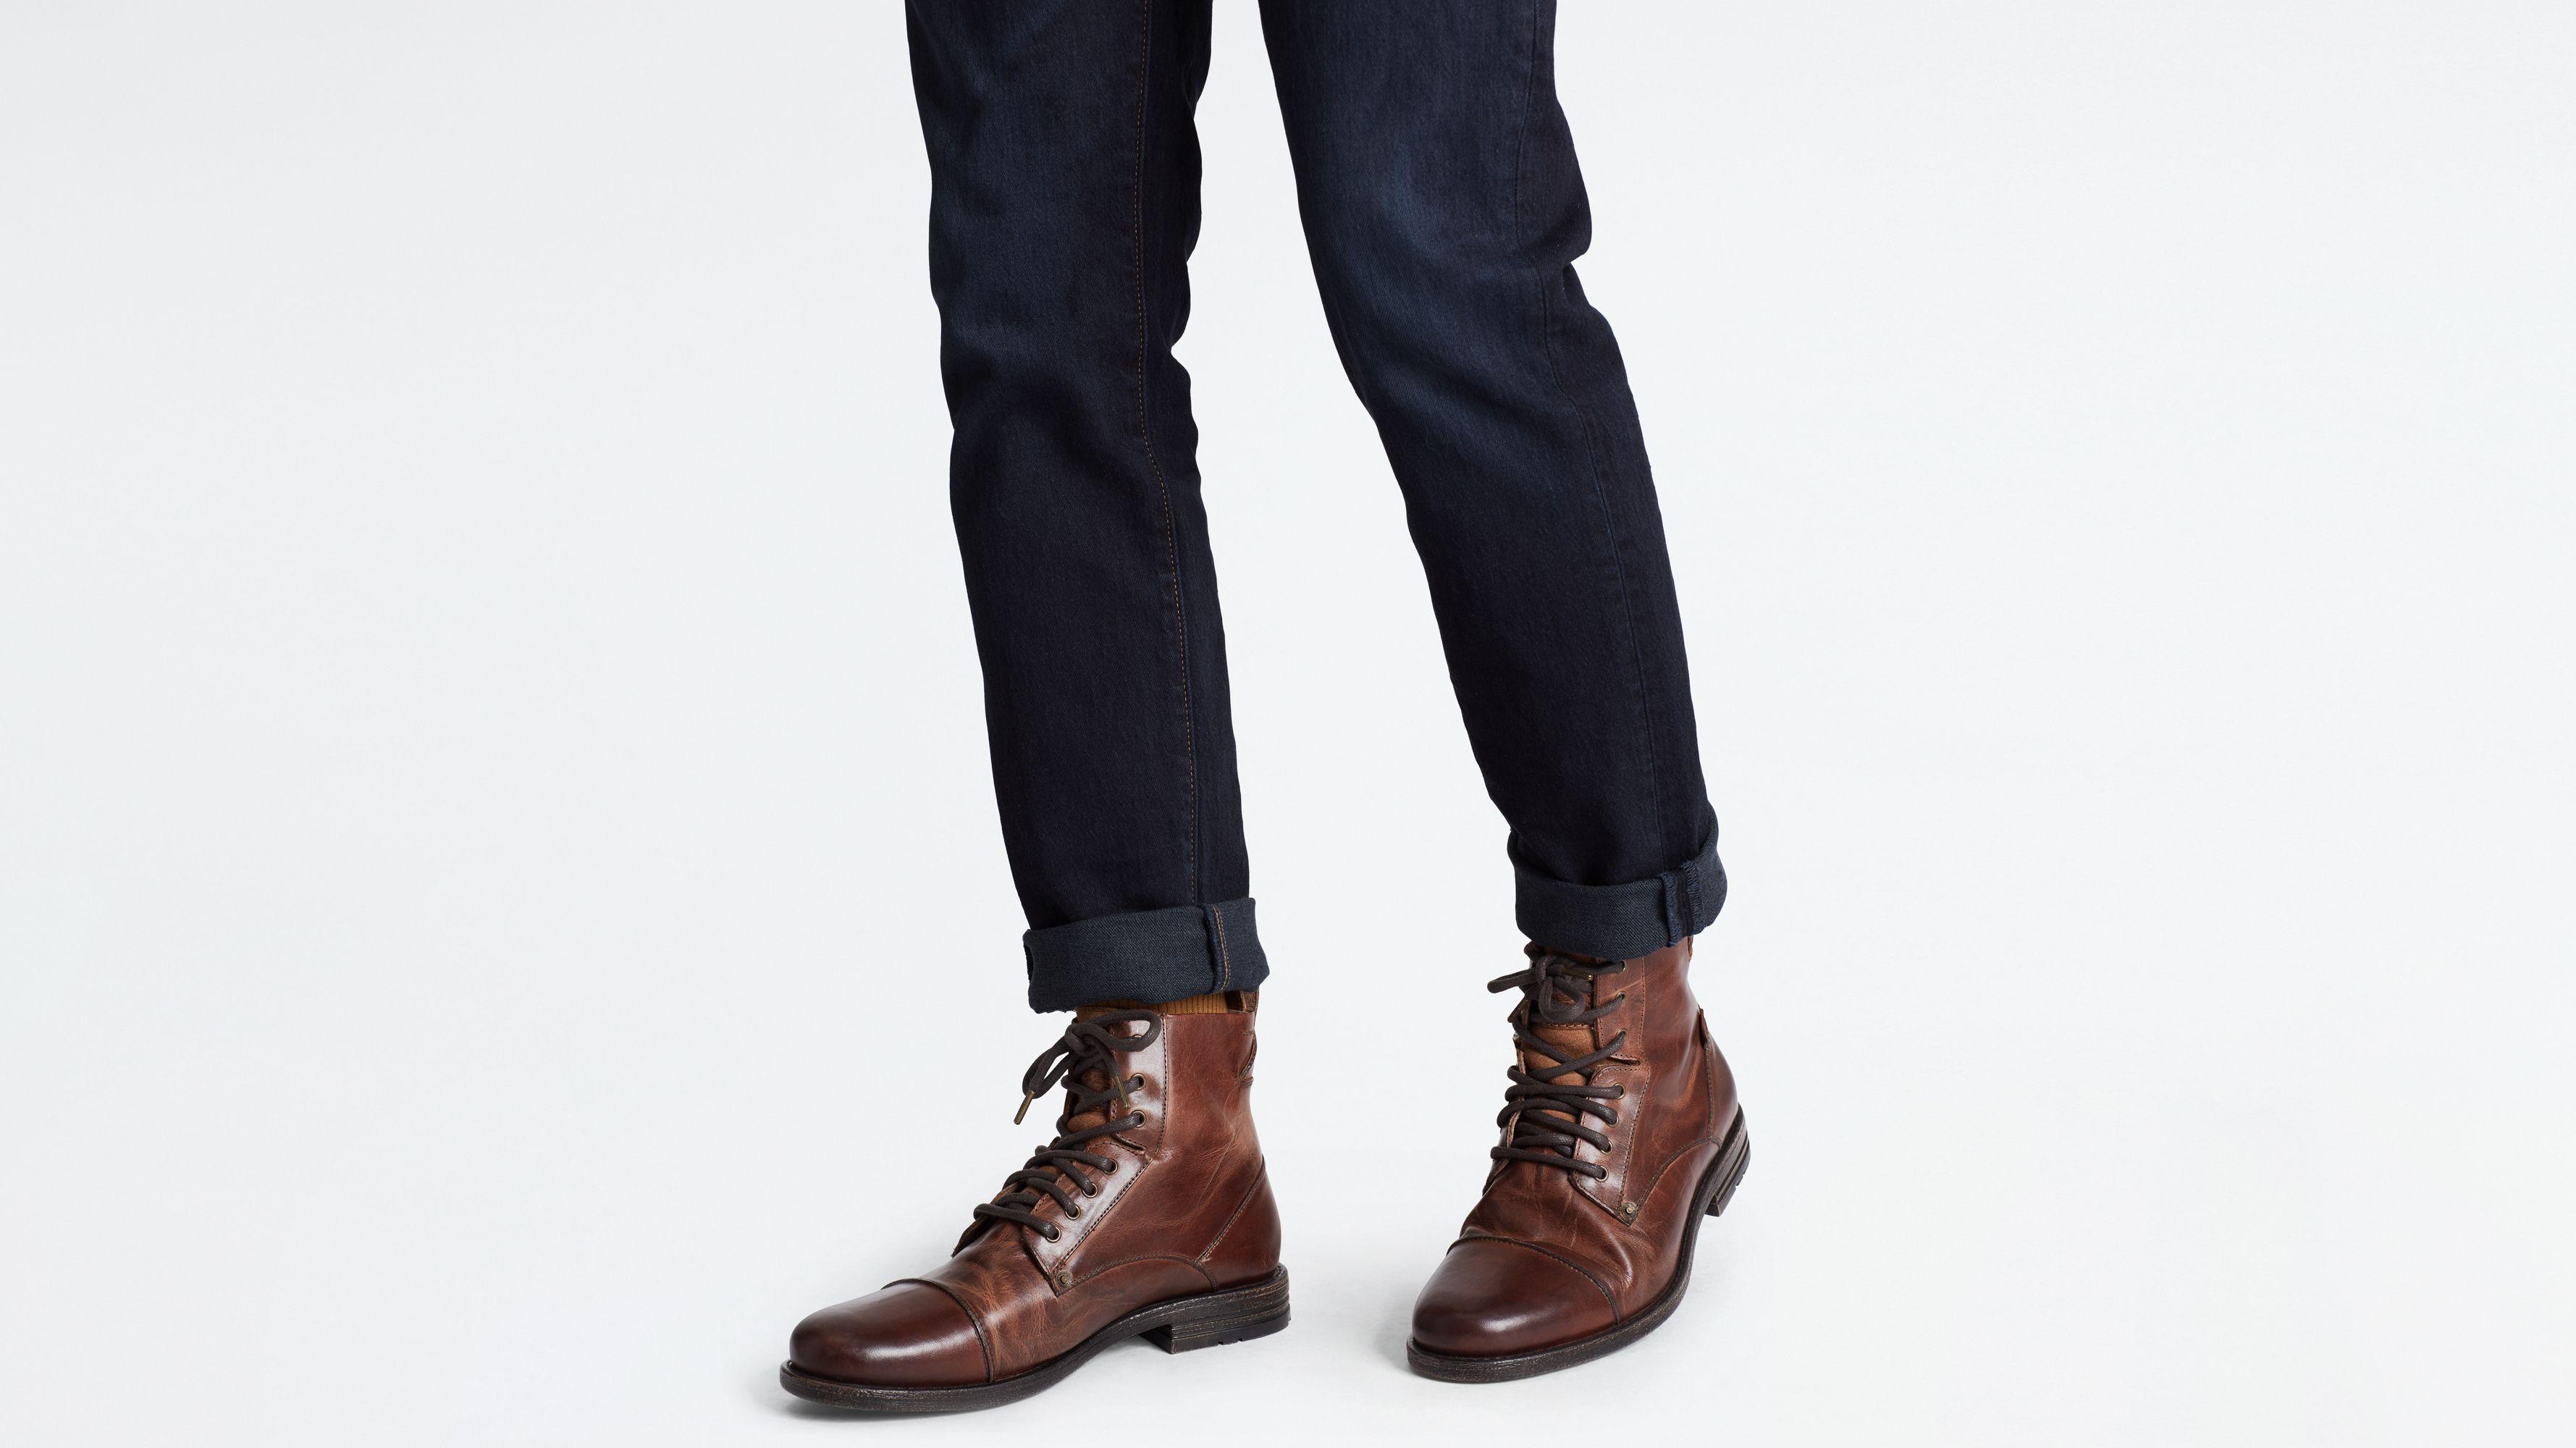 MarronLevi's® MarronLevi's® Emerson FR MarronLevi's® FR Boots Boots Emerson Emerson Boots OZuPXikT